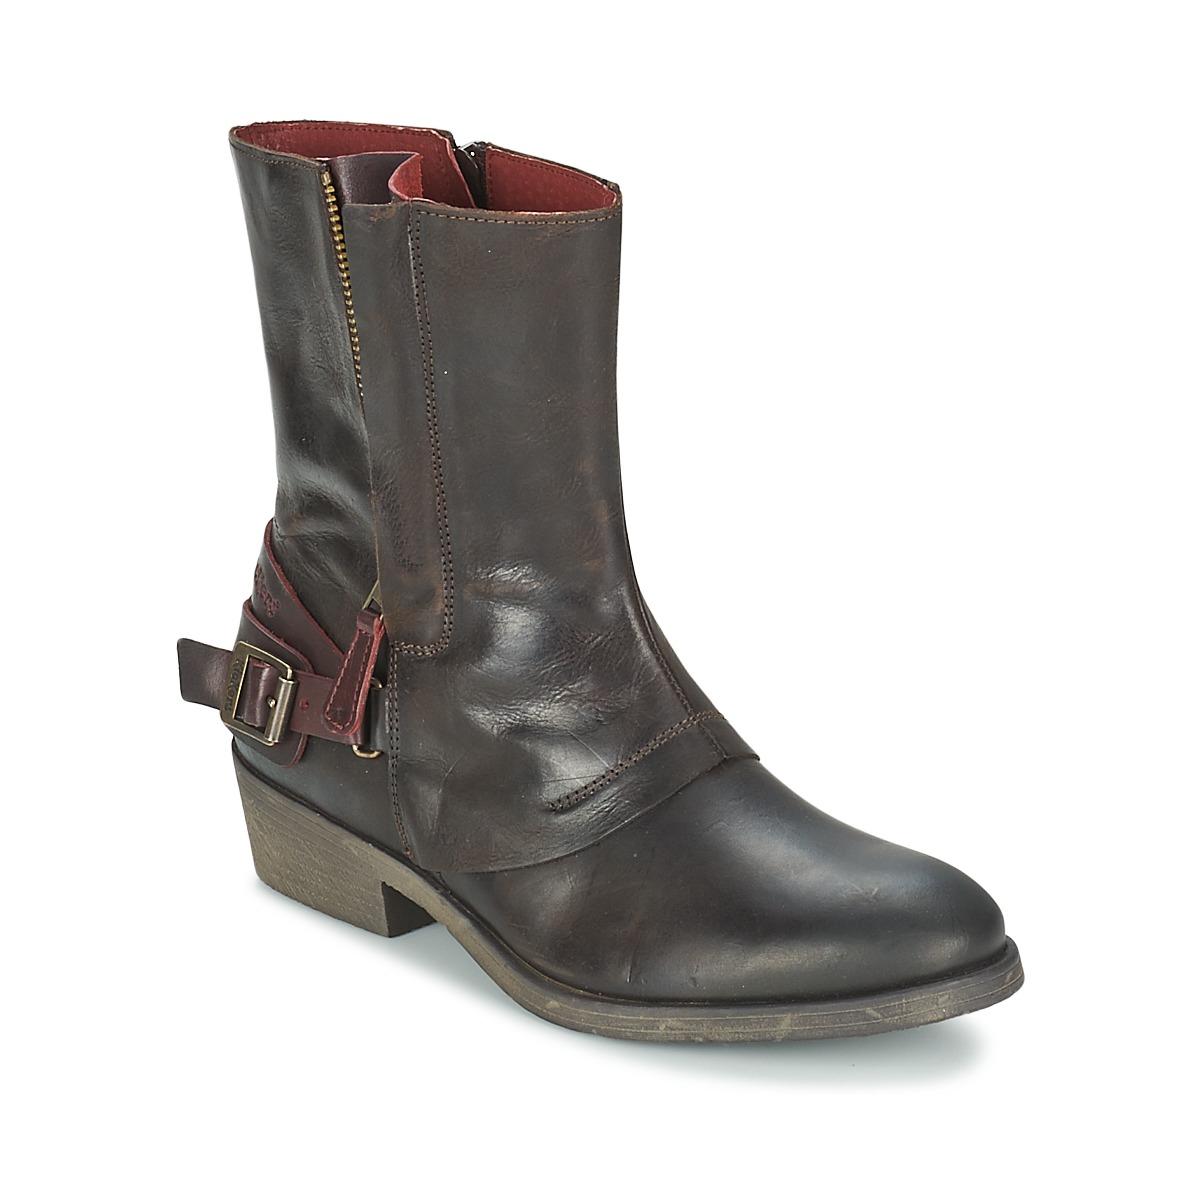 900e2e86215c Kickers AMERIKO Braun - Kostenloser Versand bei Spartoode ! - Schuhe Boots  Damen 79,50